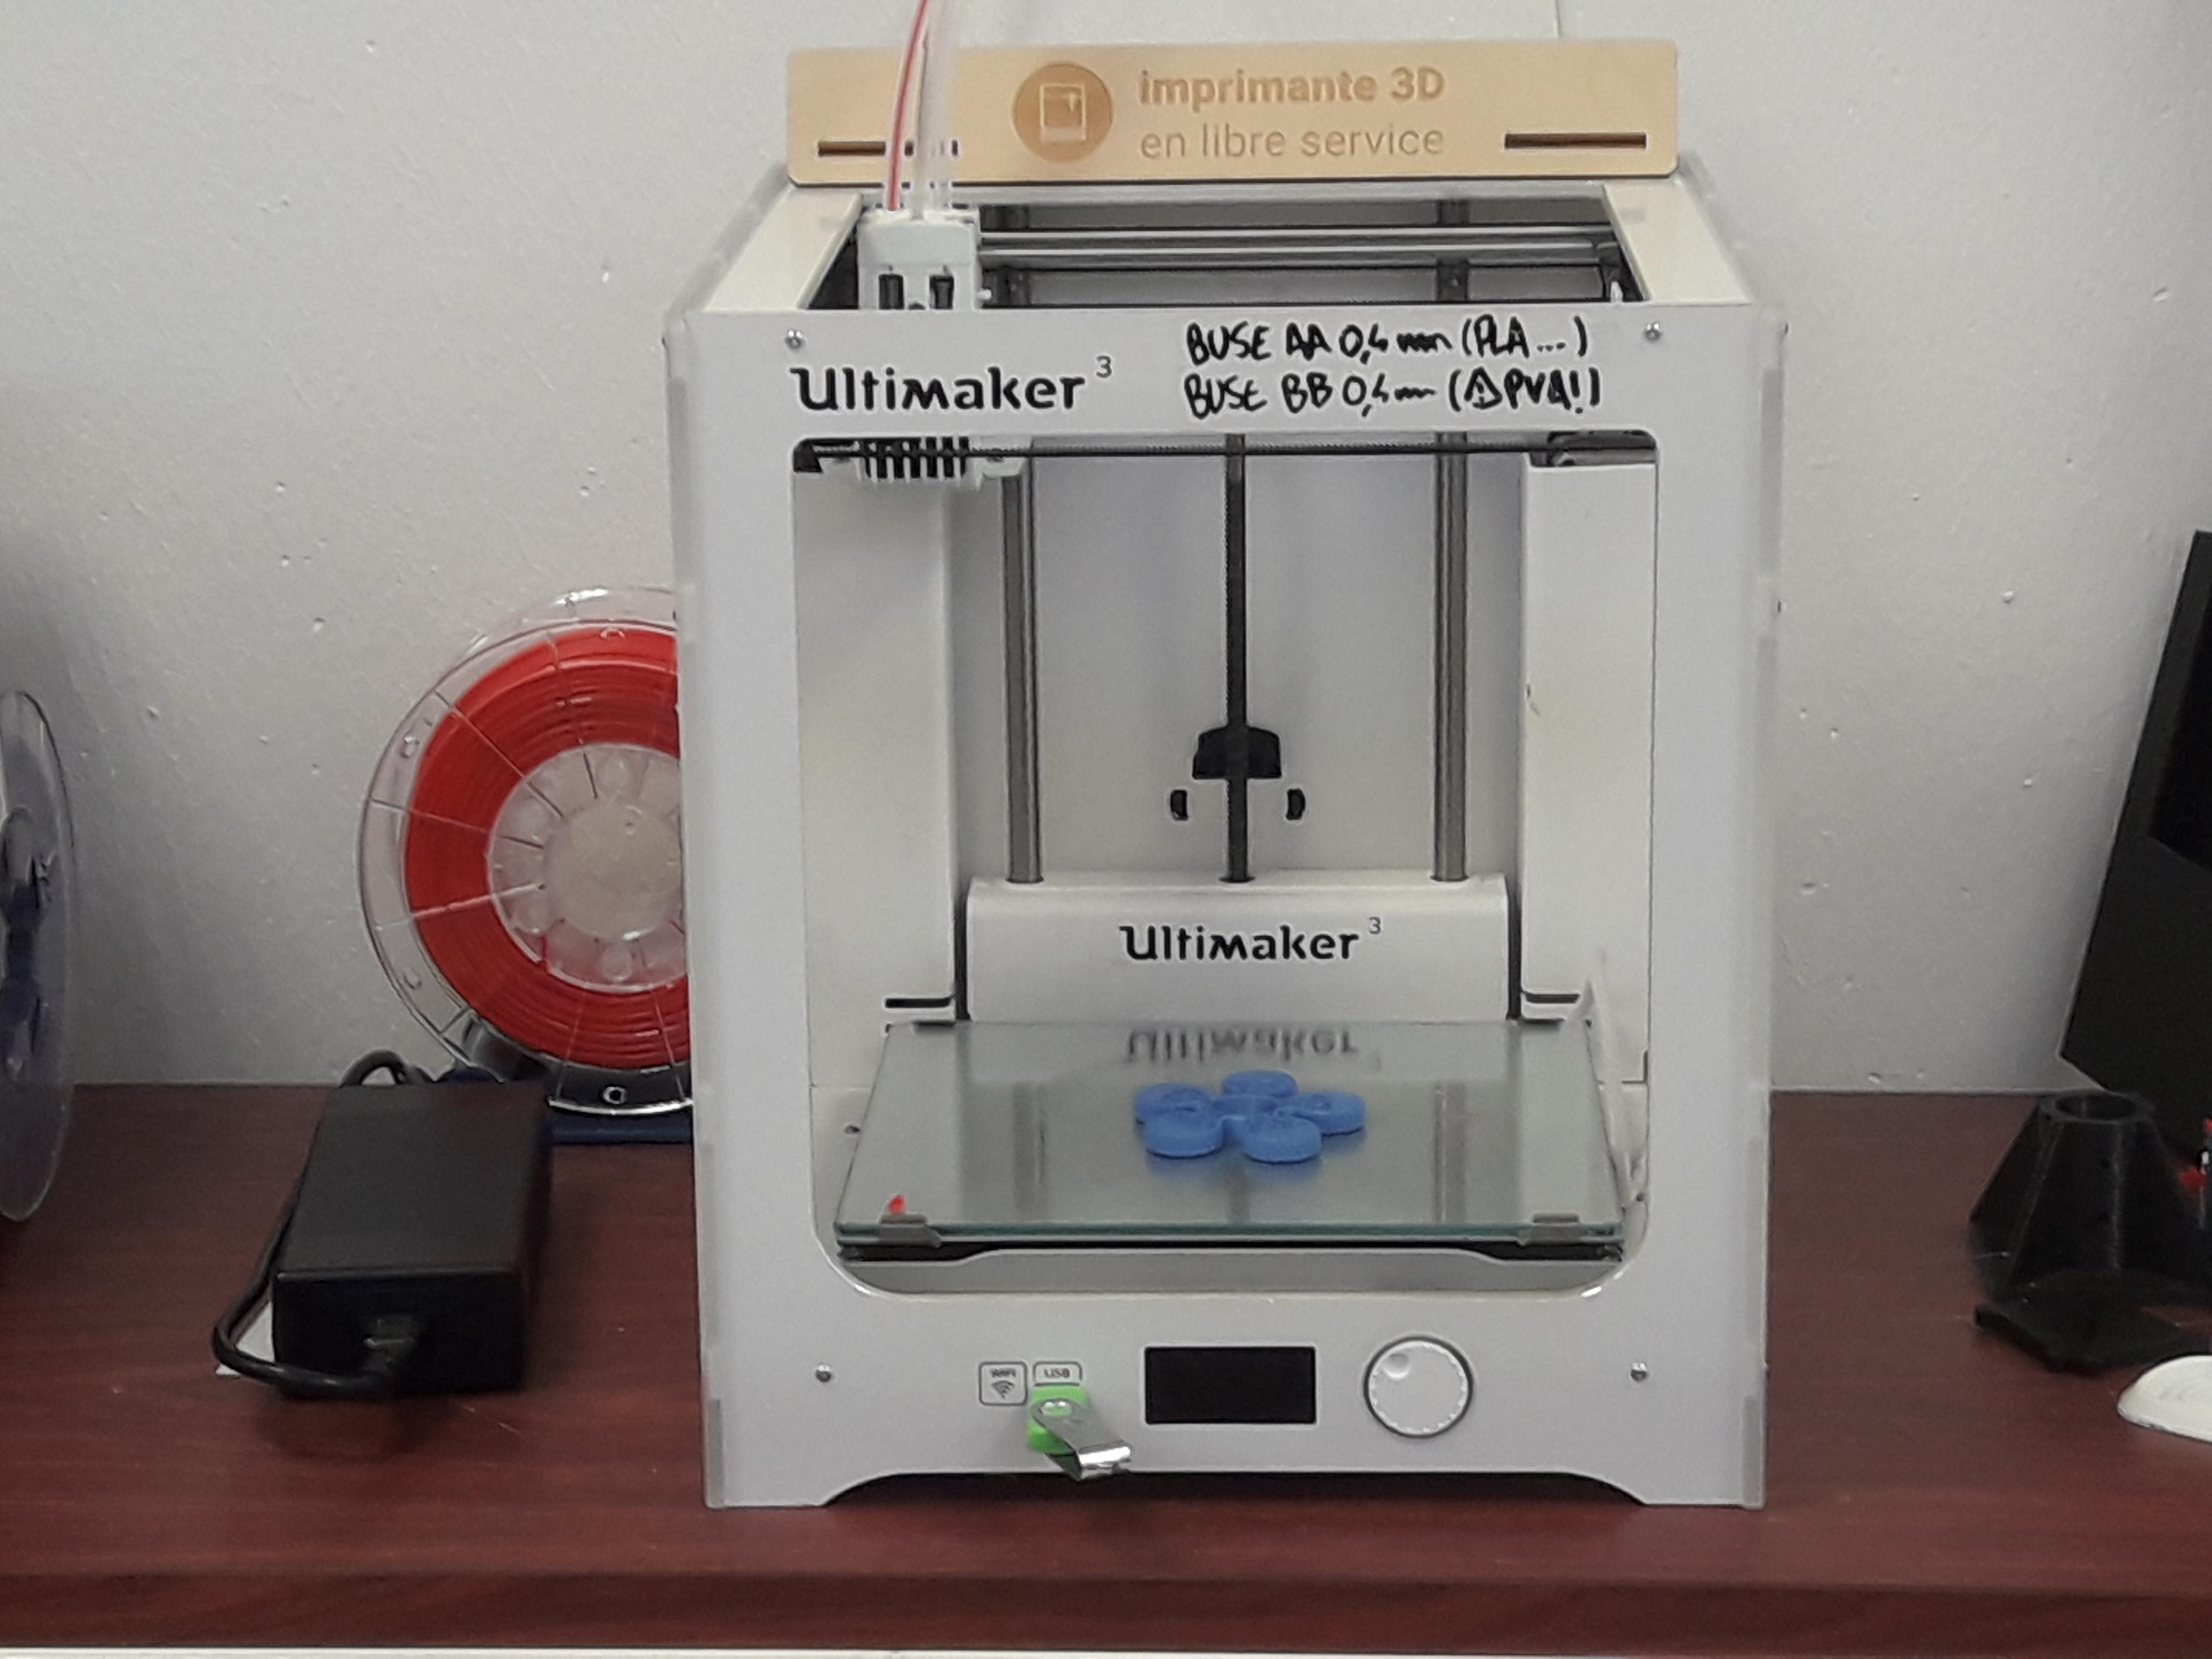 Imprimer un objet avec ULTIMAKER 20180315 171208 1 .jpg